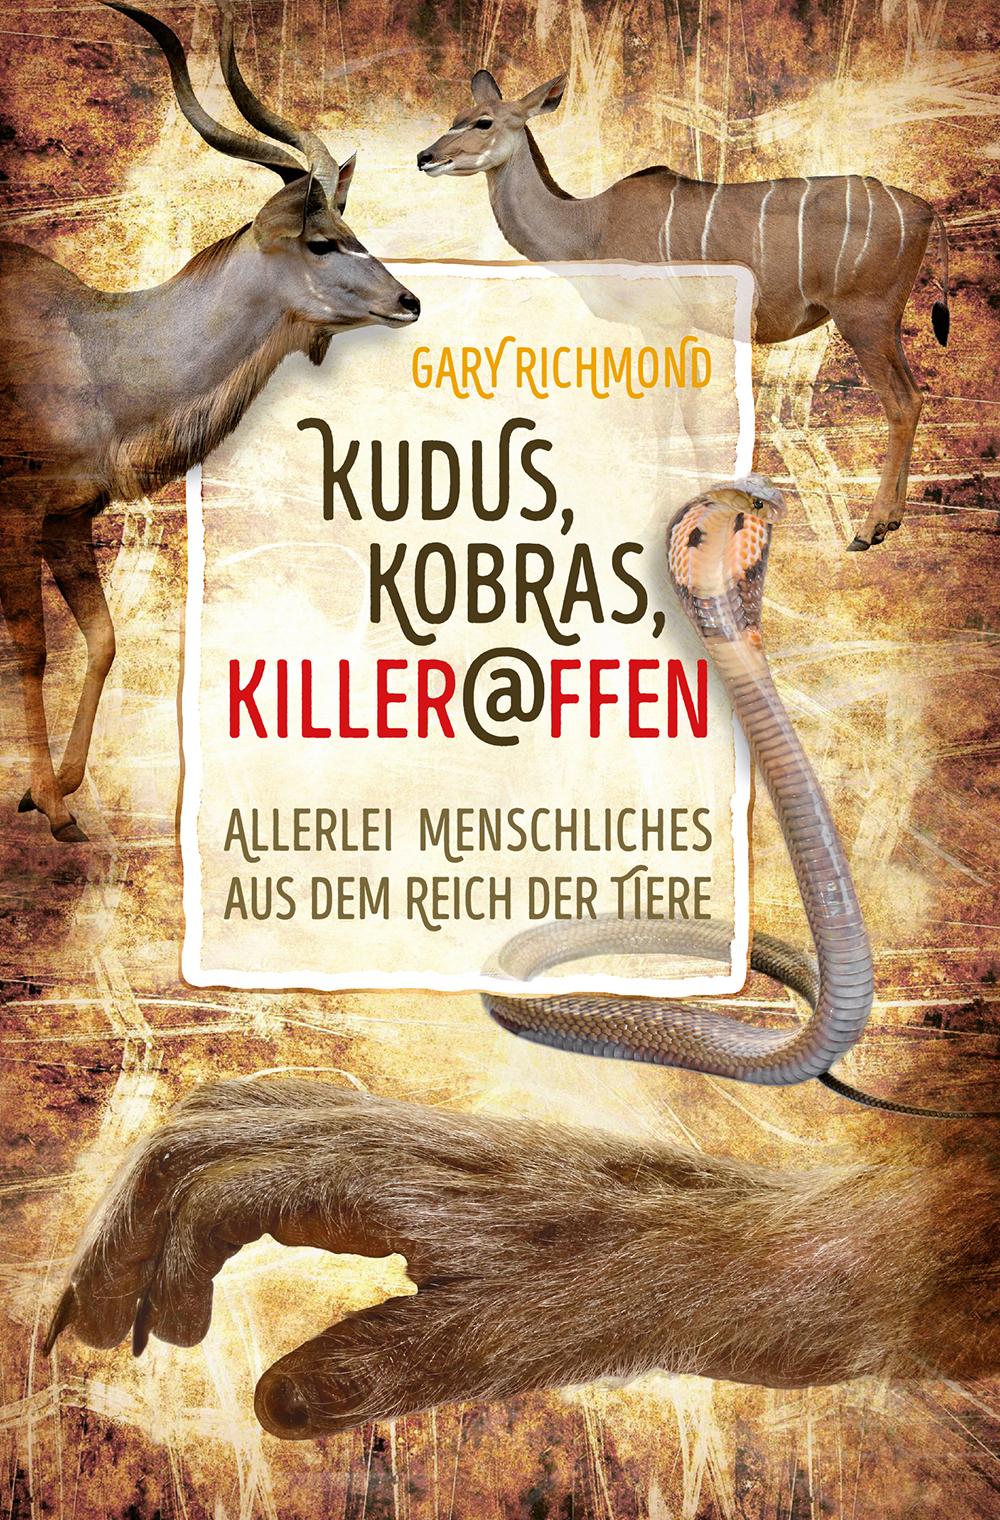 CLV_kudus-kobras-killeraffen_gary-richmond_256274_1